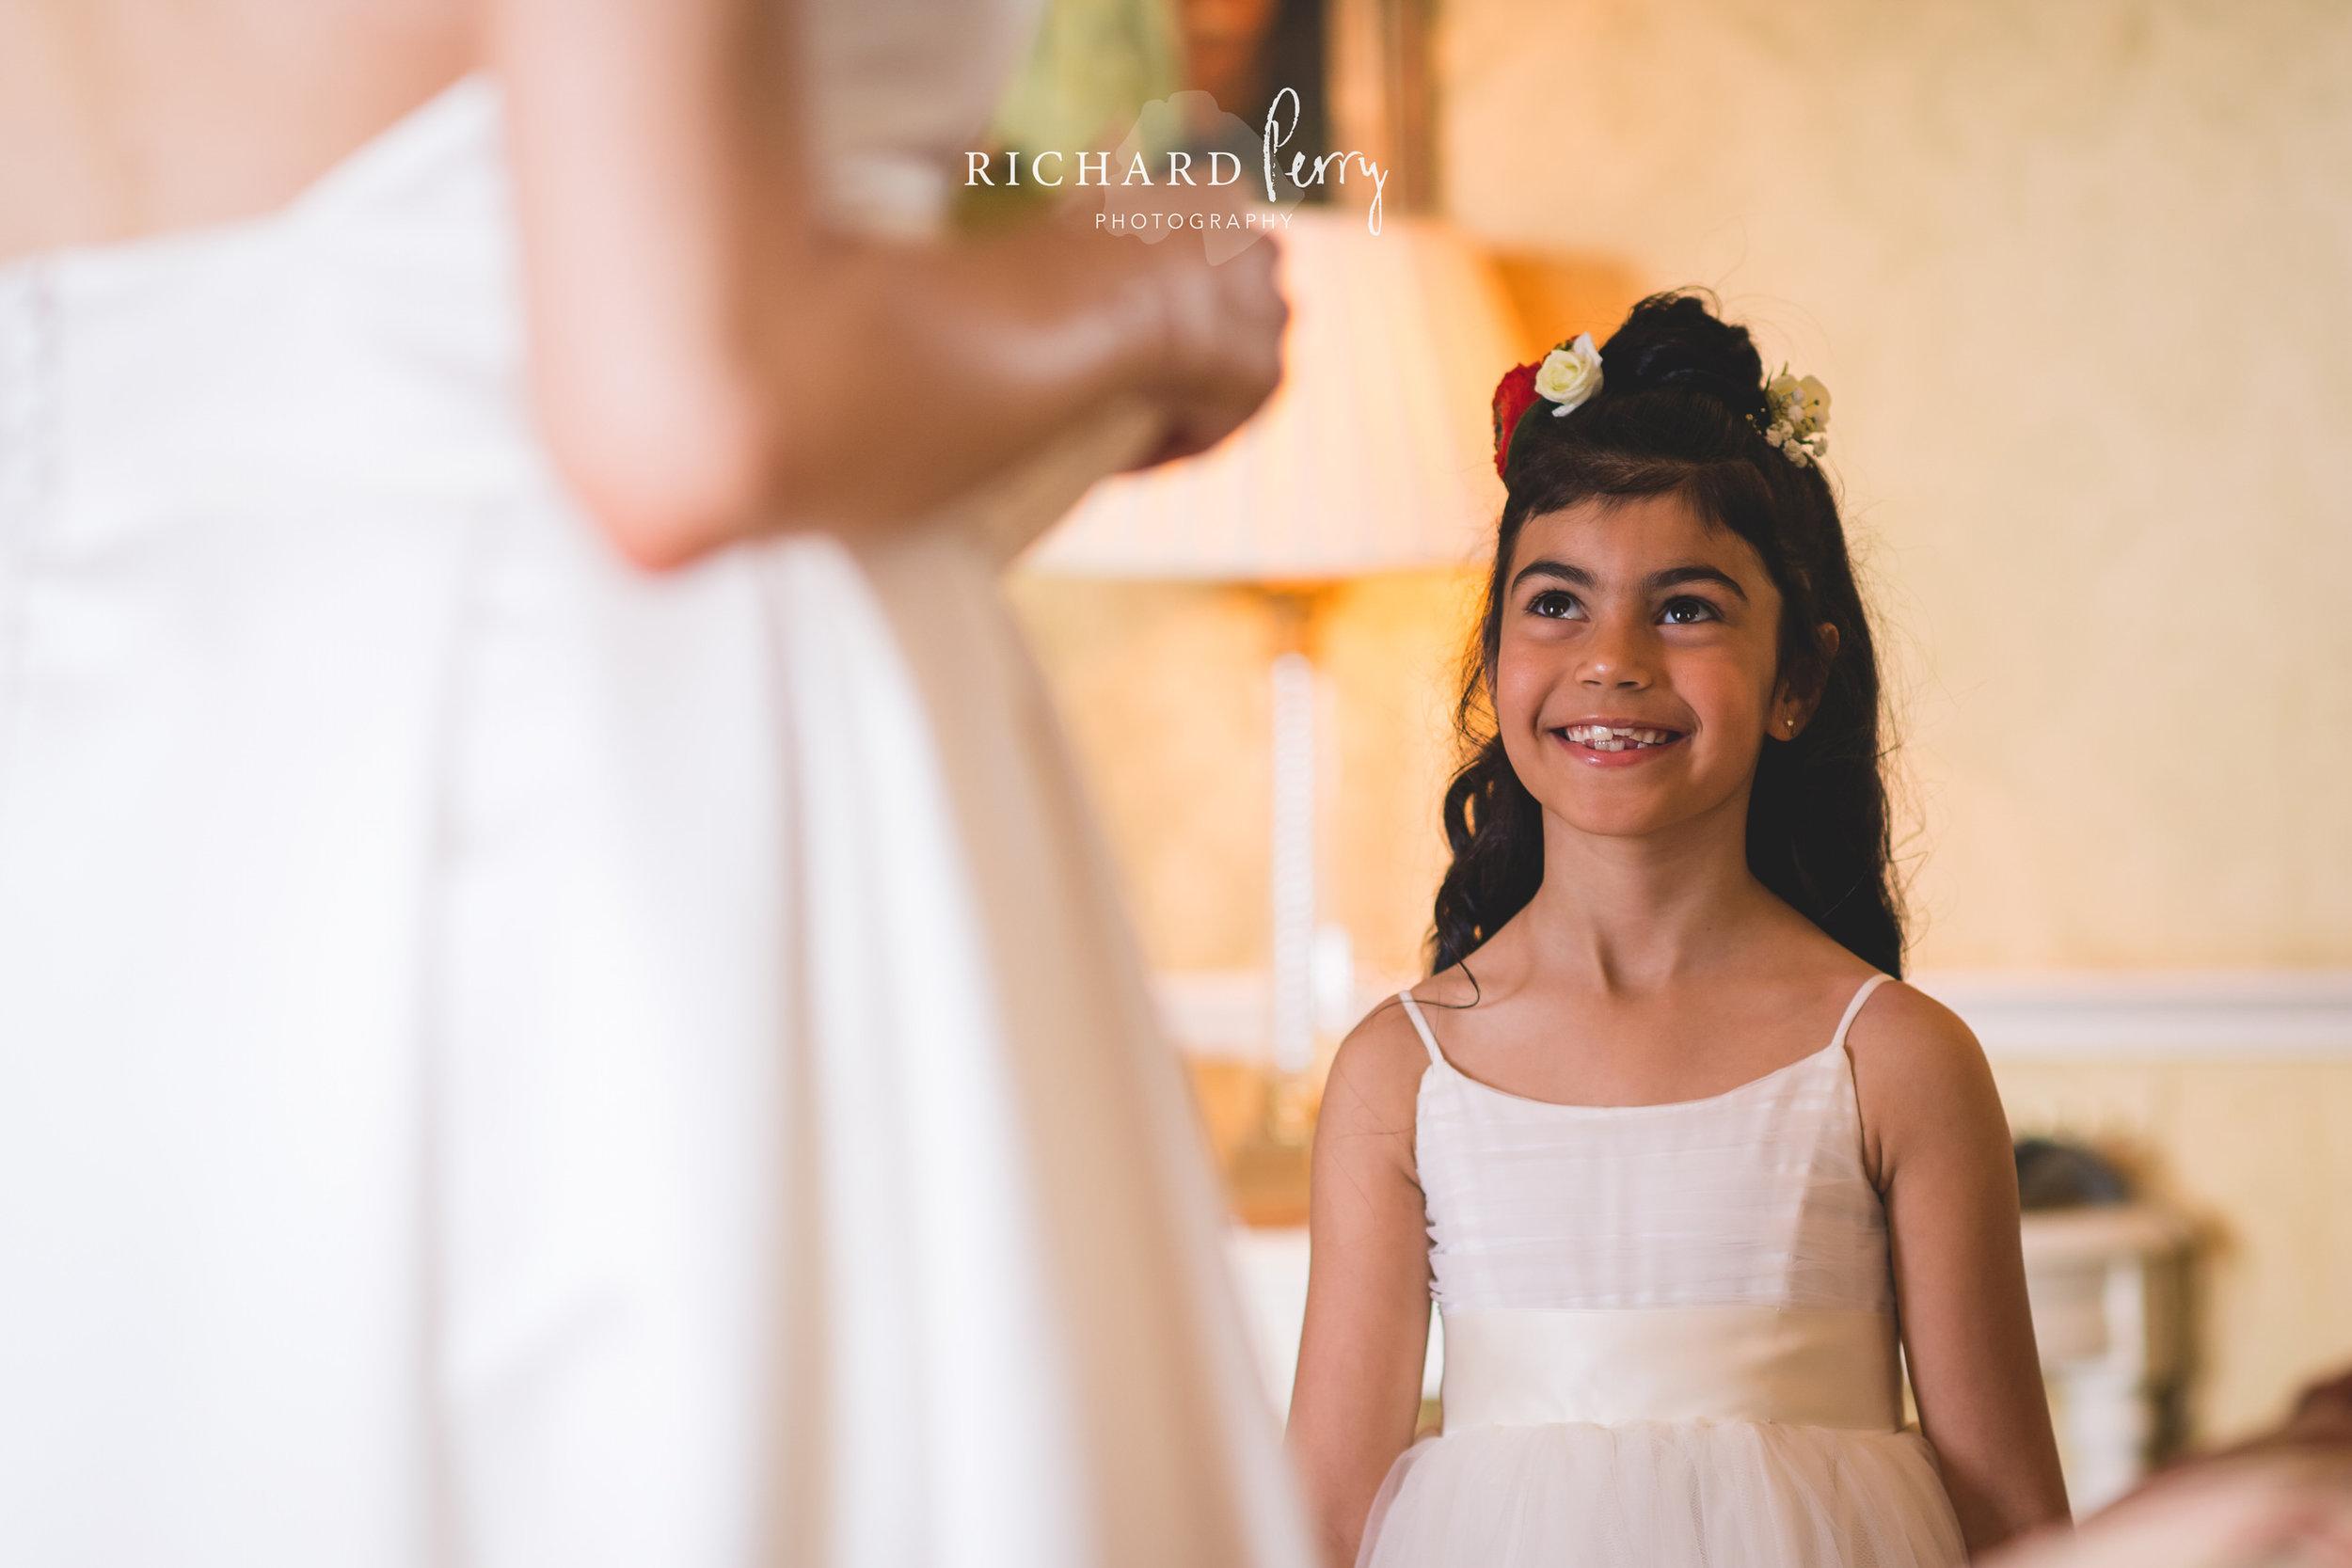 yorkshire-wedding-photographer-destination-archerfield-house-11.jpg